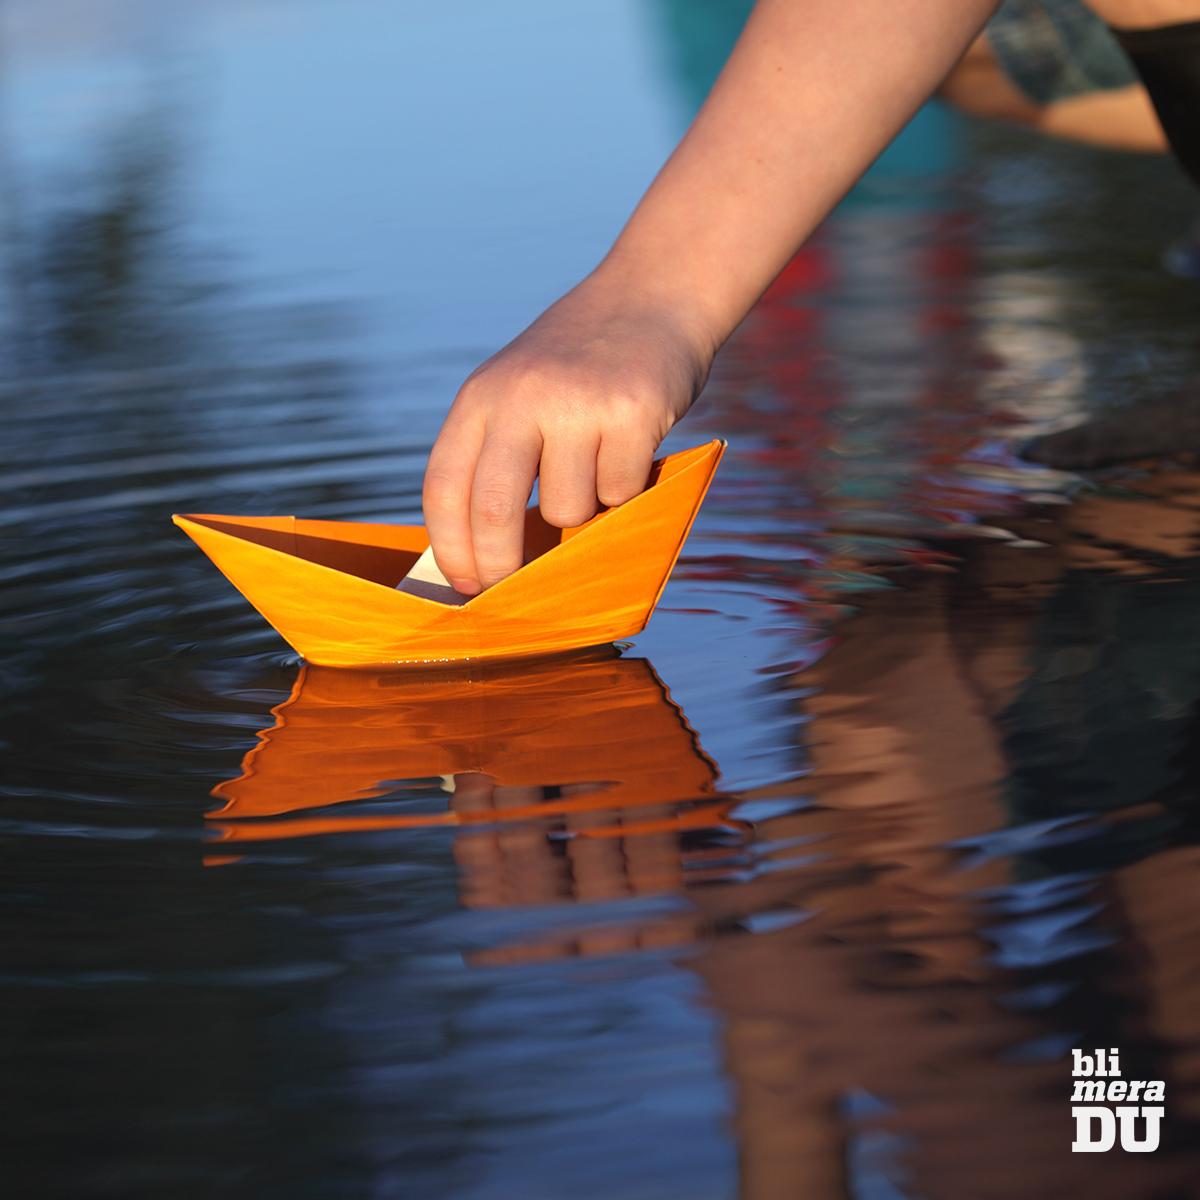 Pojke sjösätter orange pappersbåt